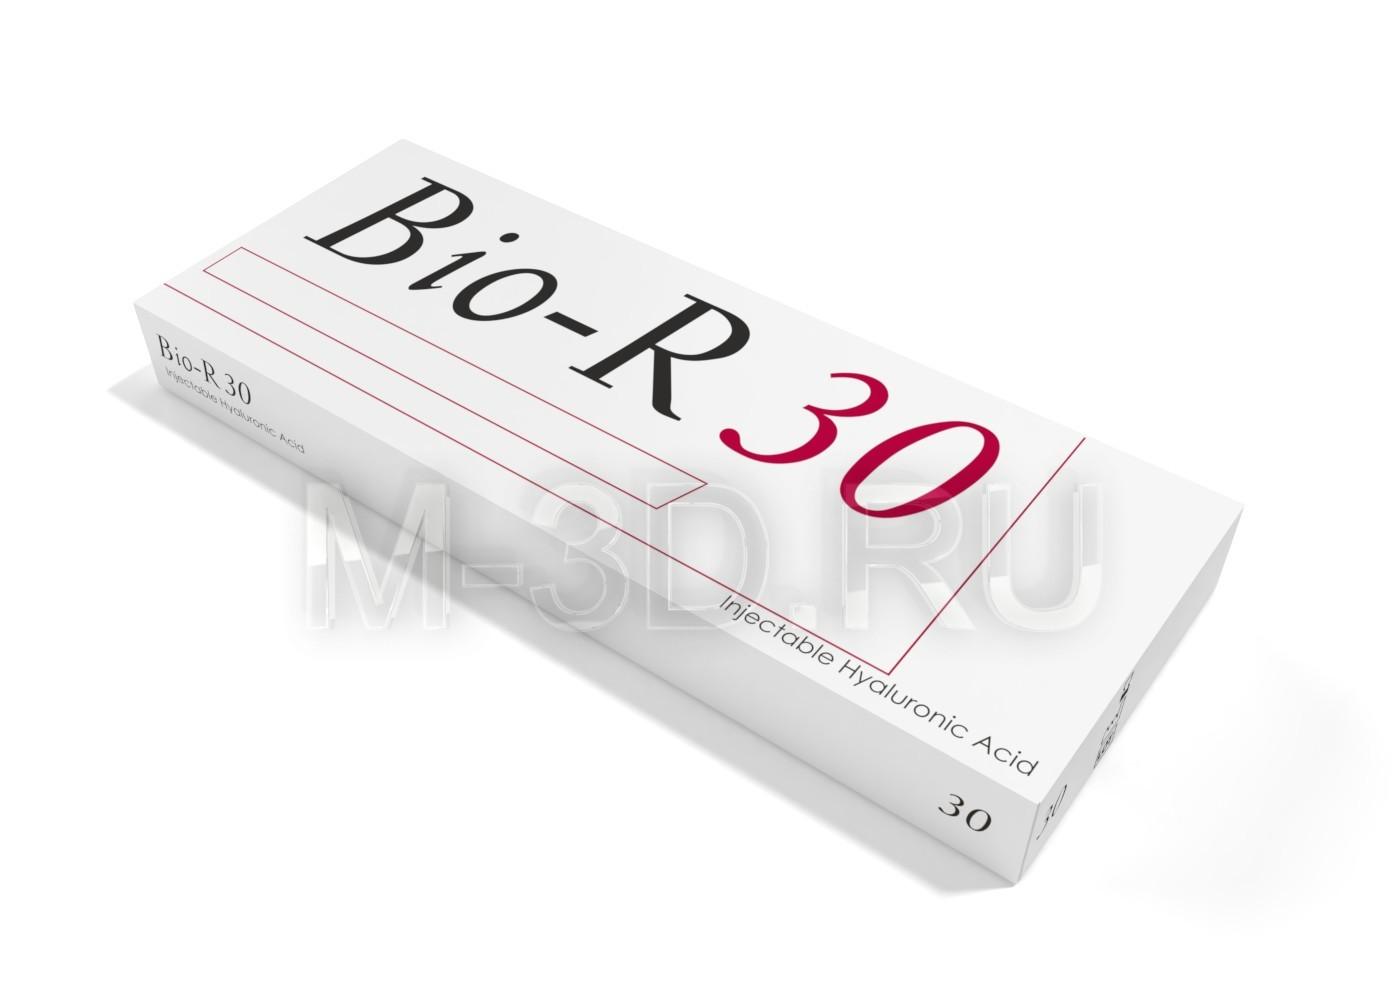 Коробка для лекарств картонная упаковка